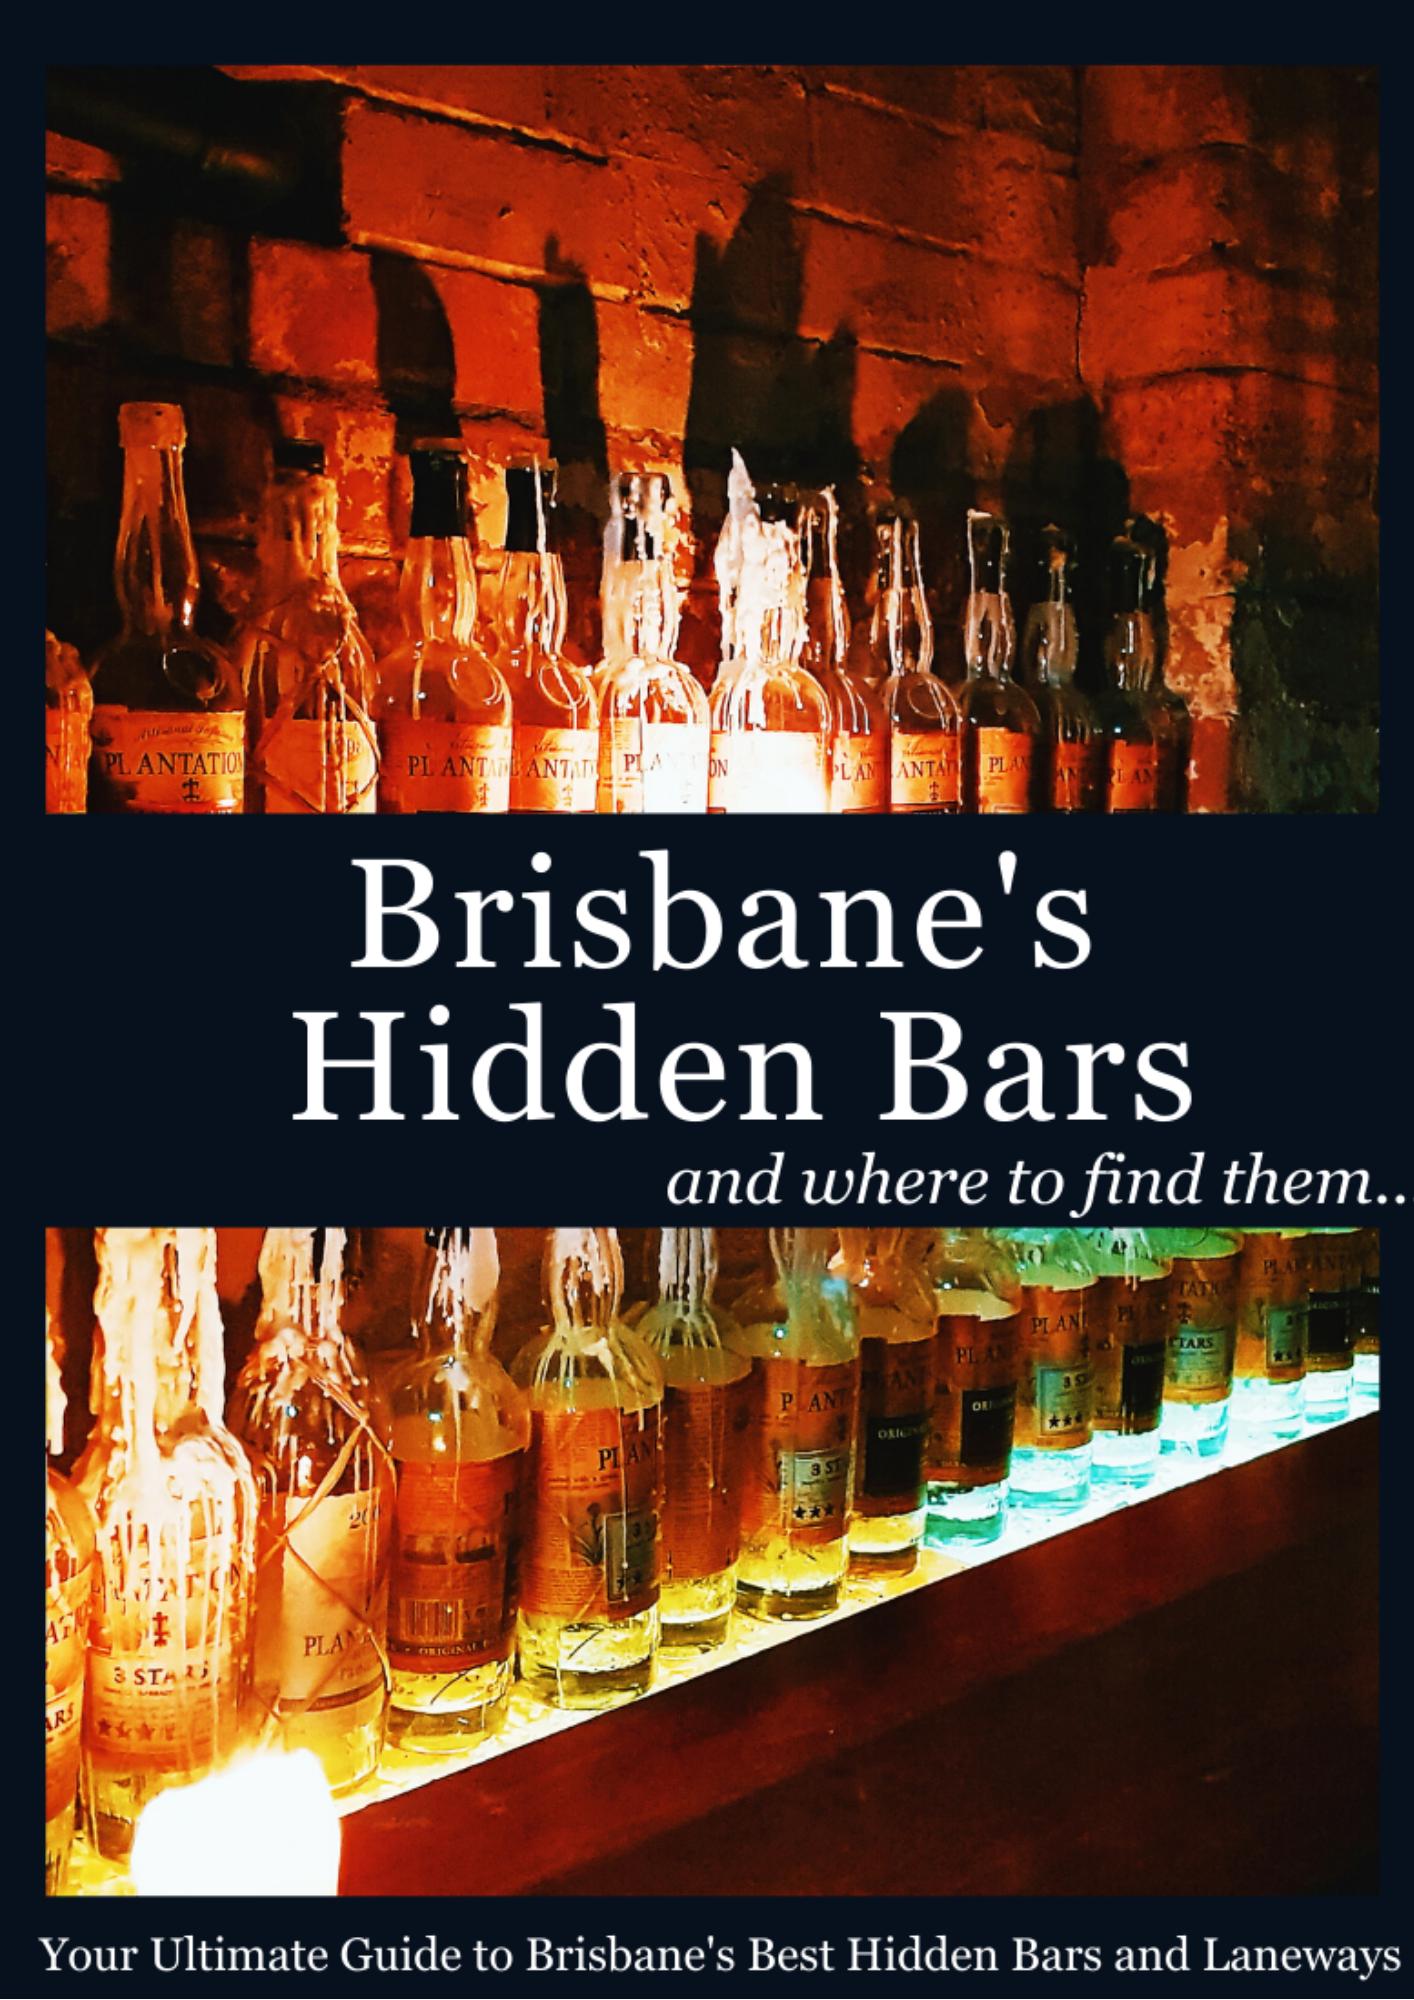 Brisbane's hidden bars